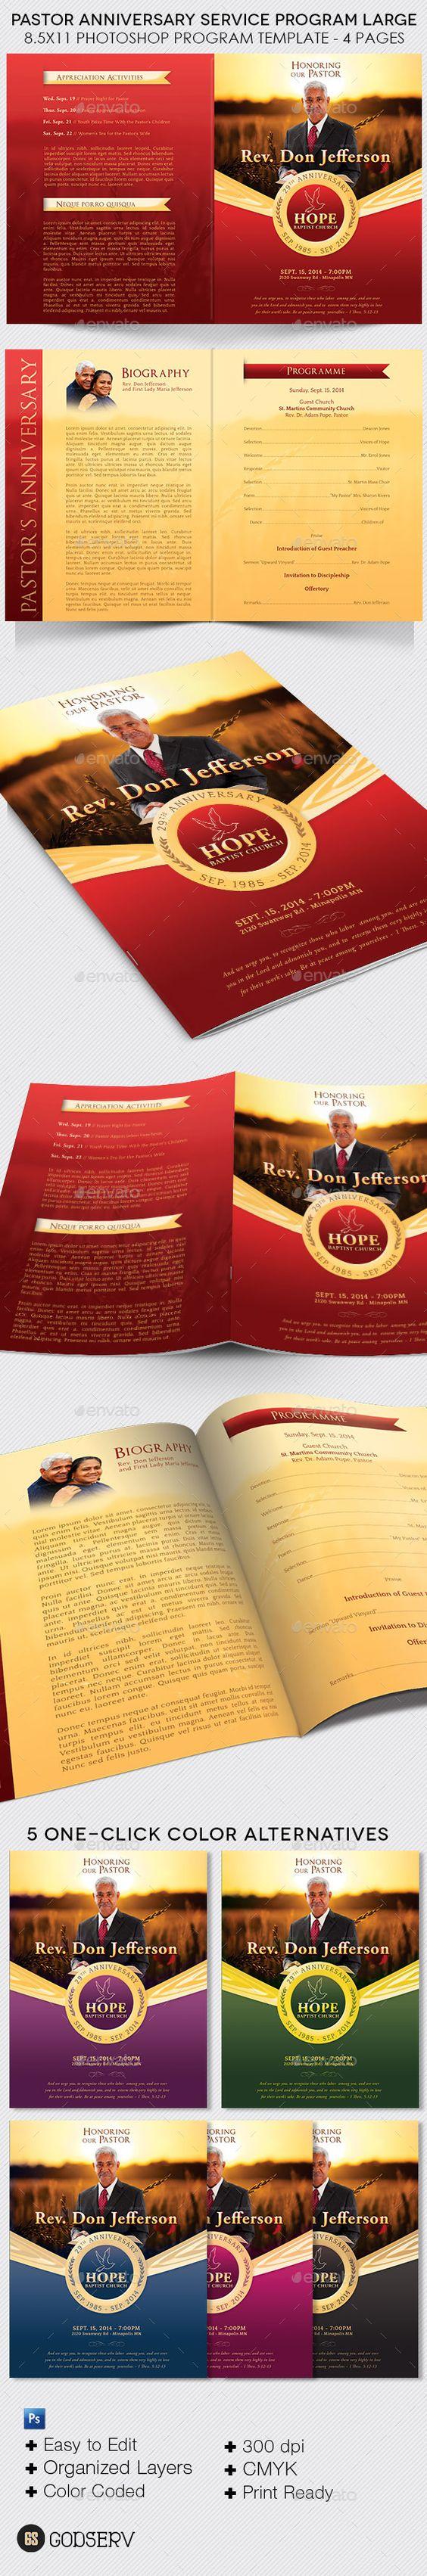 pastor anniversary service program large template graphic design